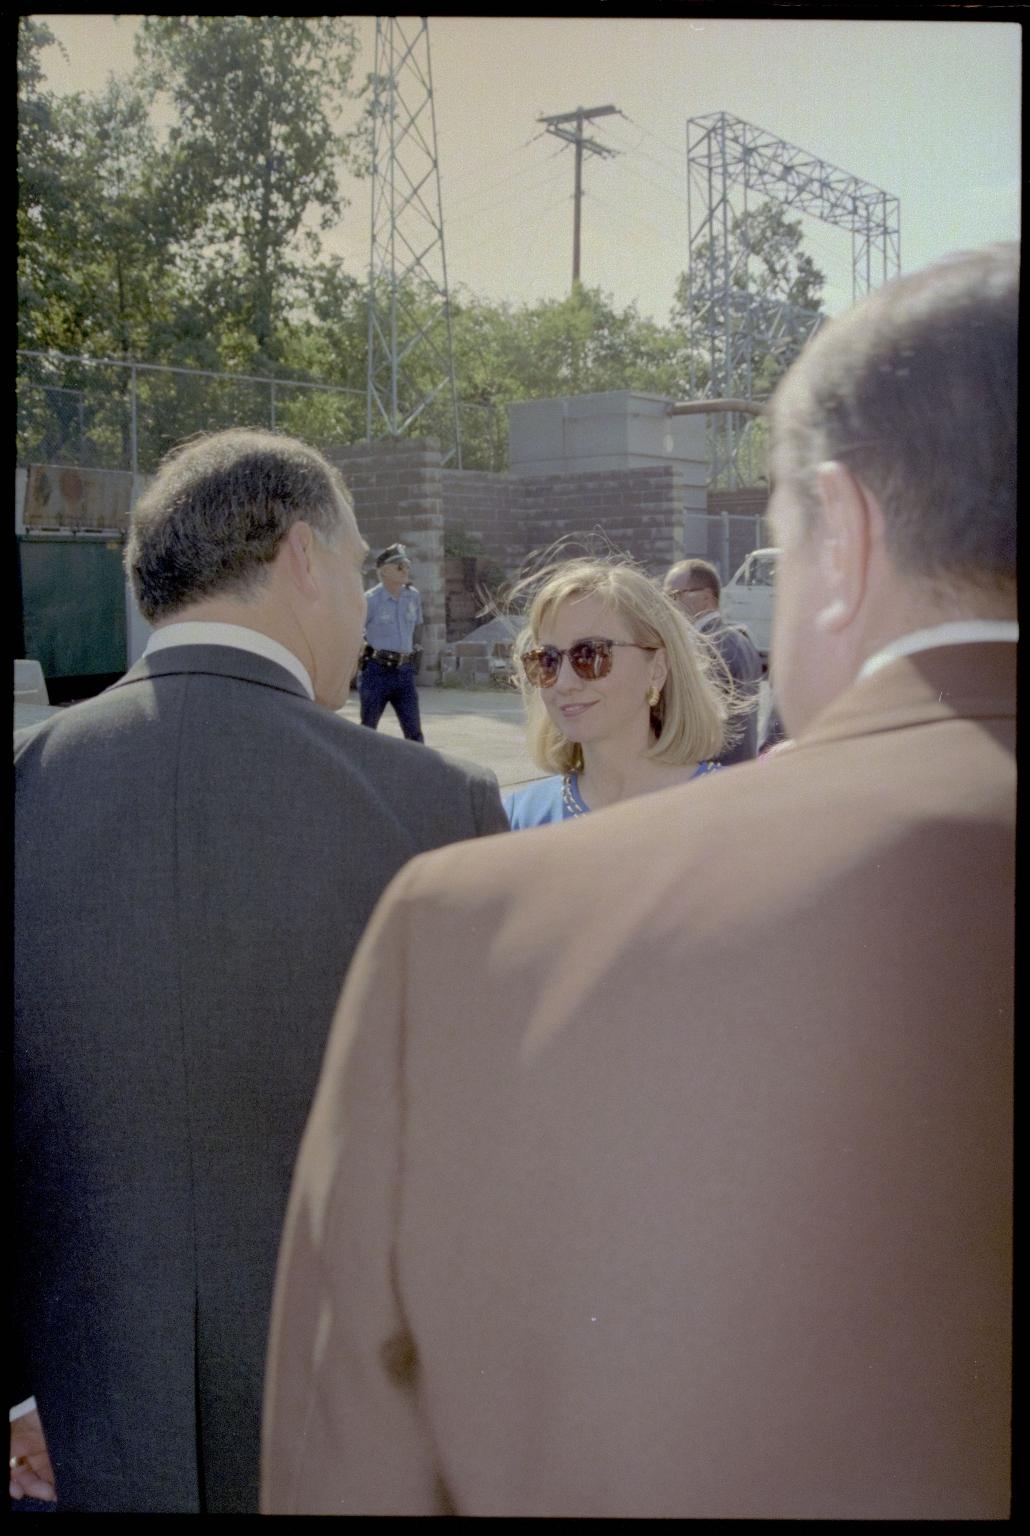 Hillary Rodham Clinton at the